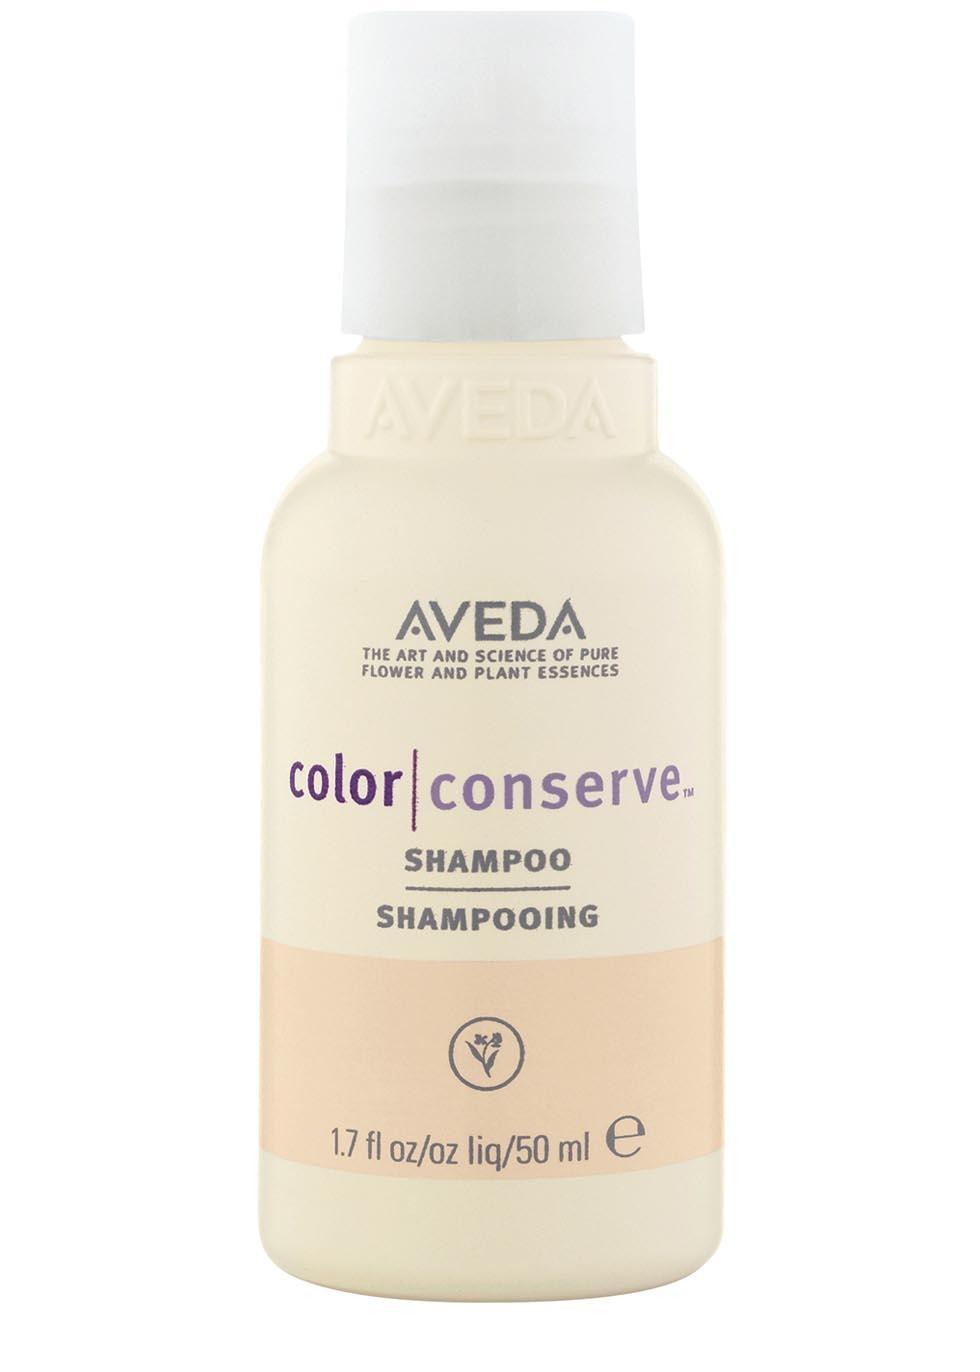 Color Conserve™ Shampoo 50ml